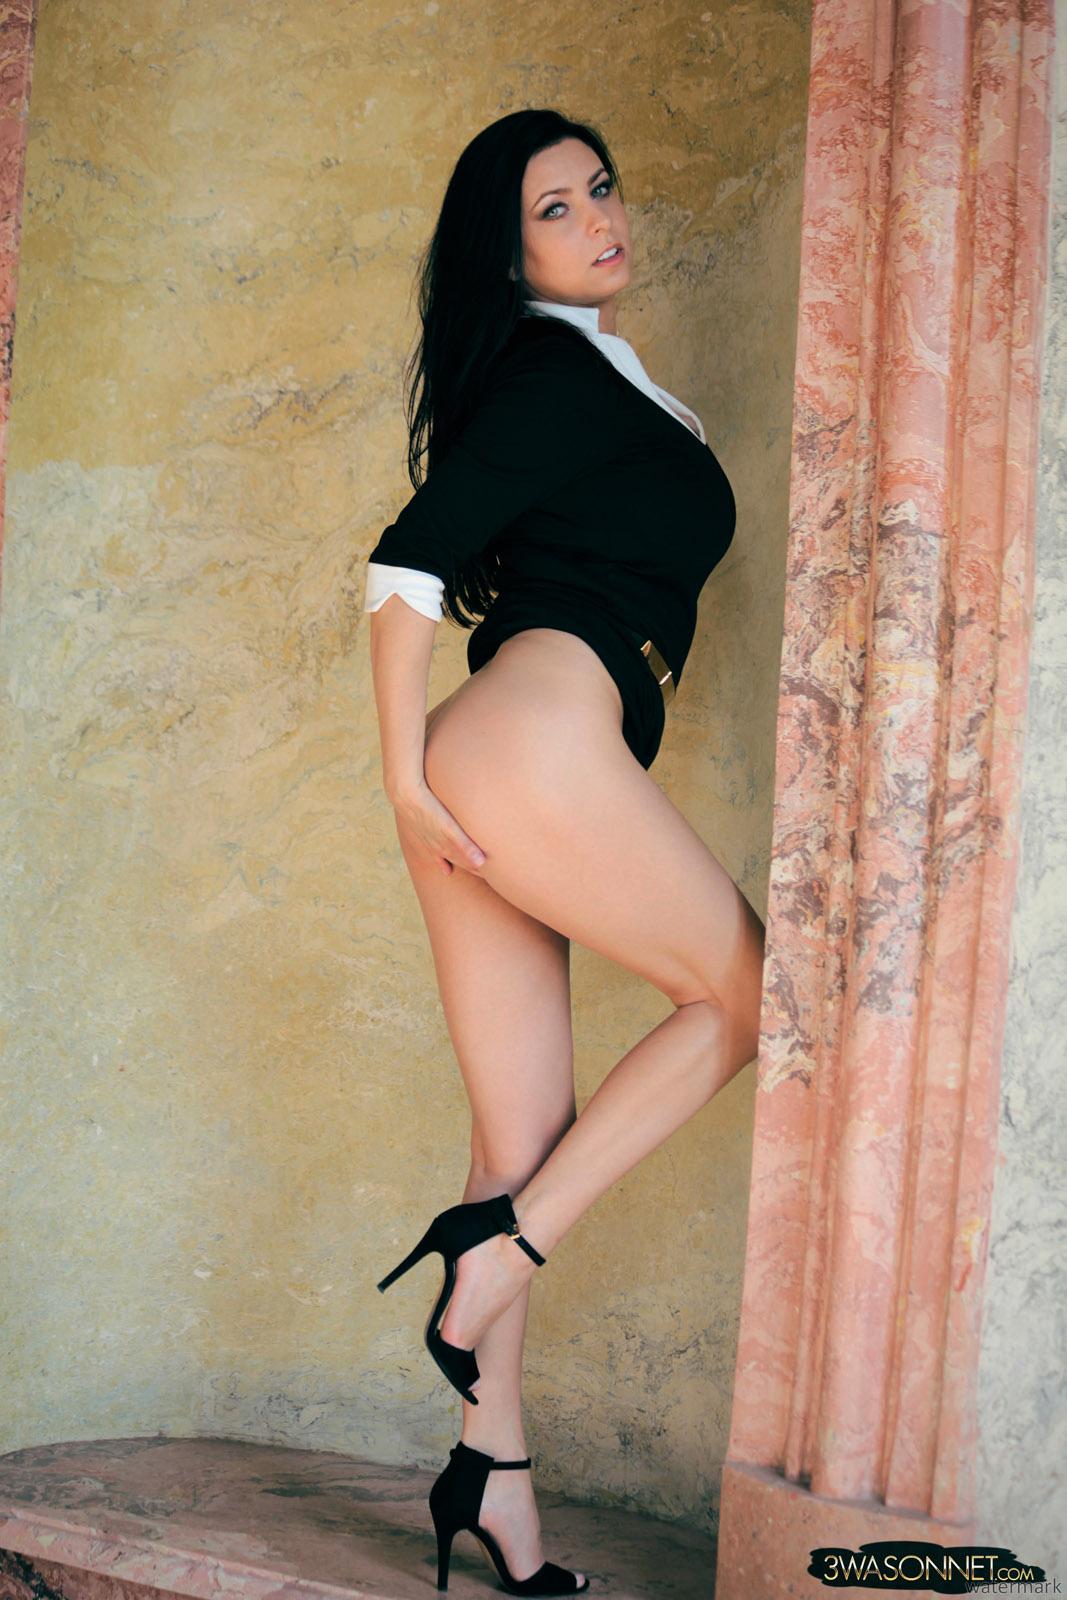 Ewa sonnet topless bending over — img 12